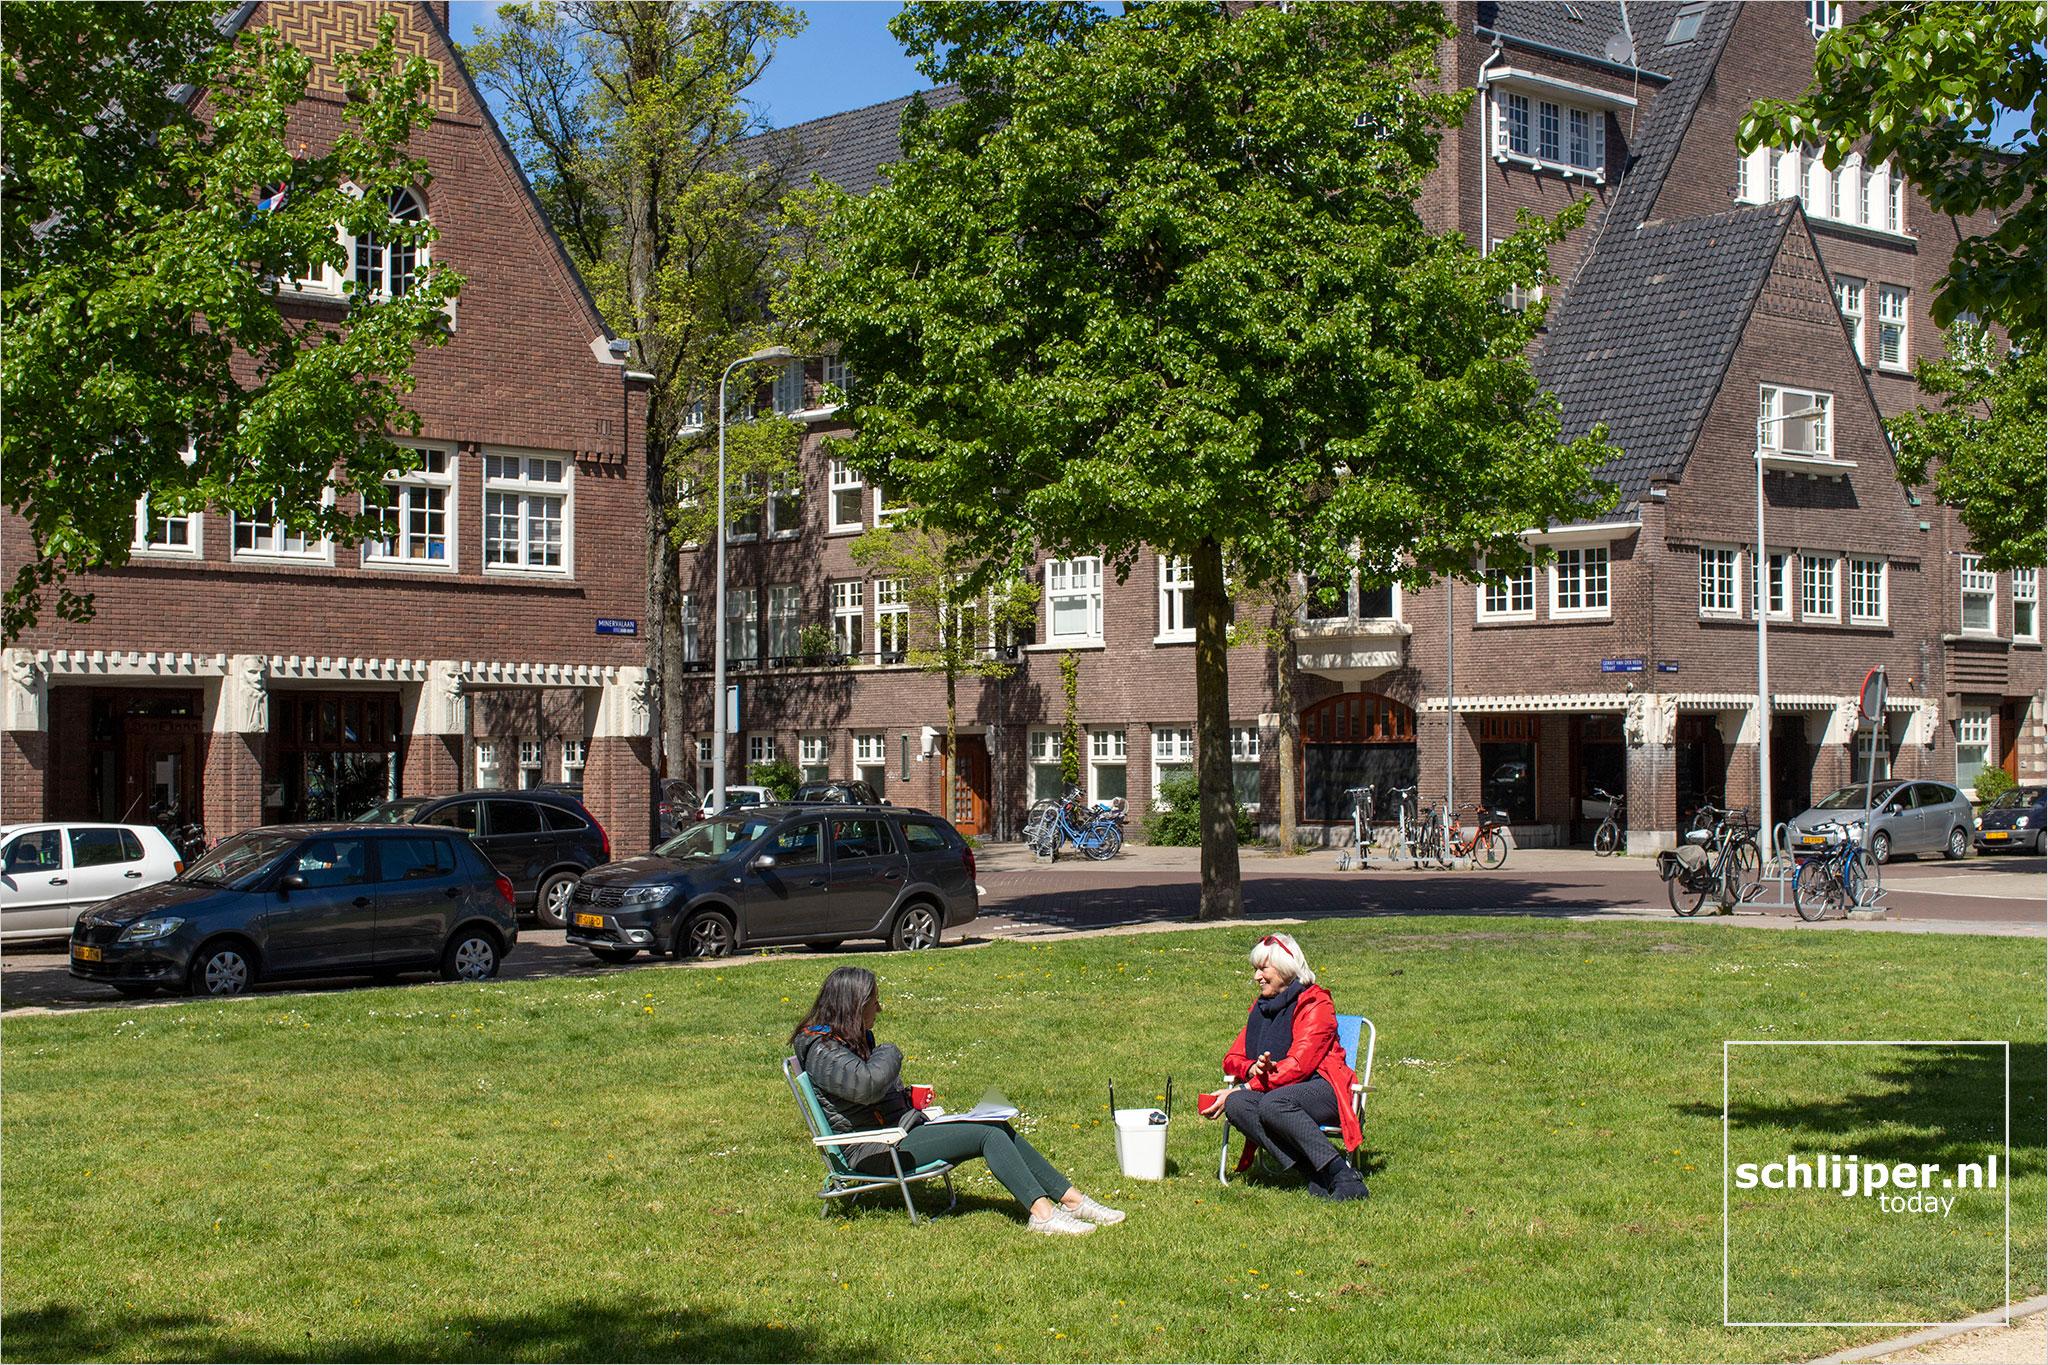 Nederland, Amsterdam, 5 mei 2020